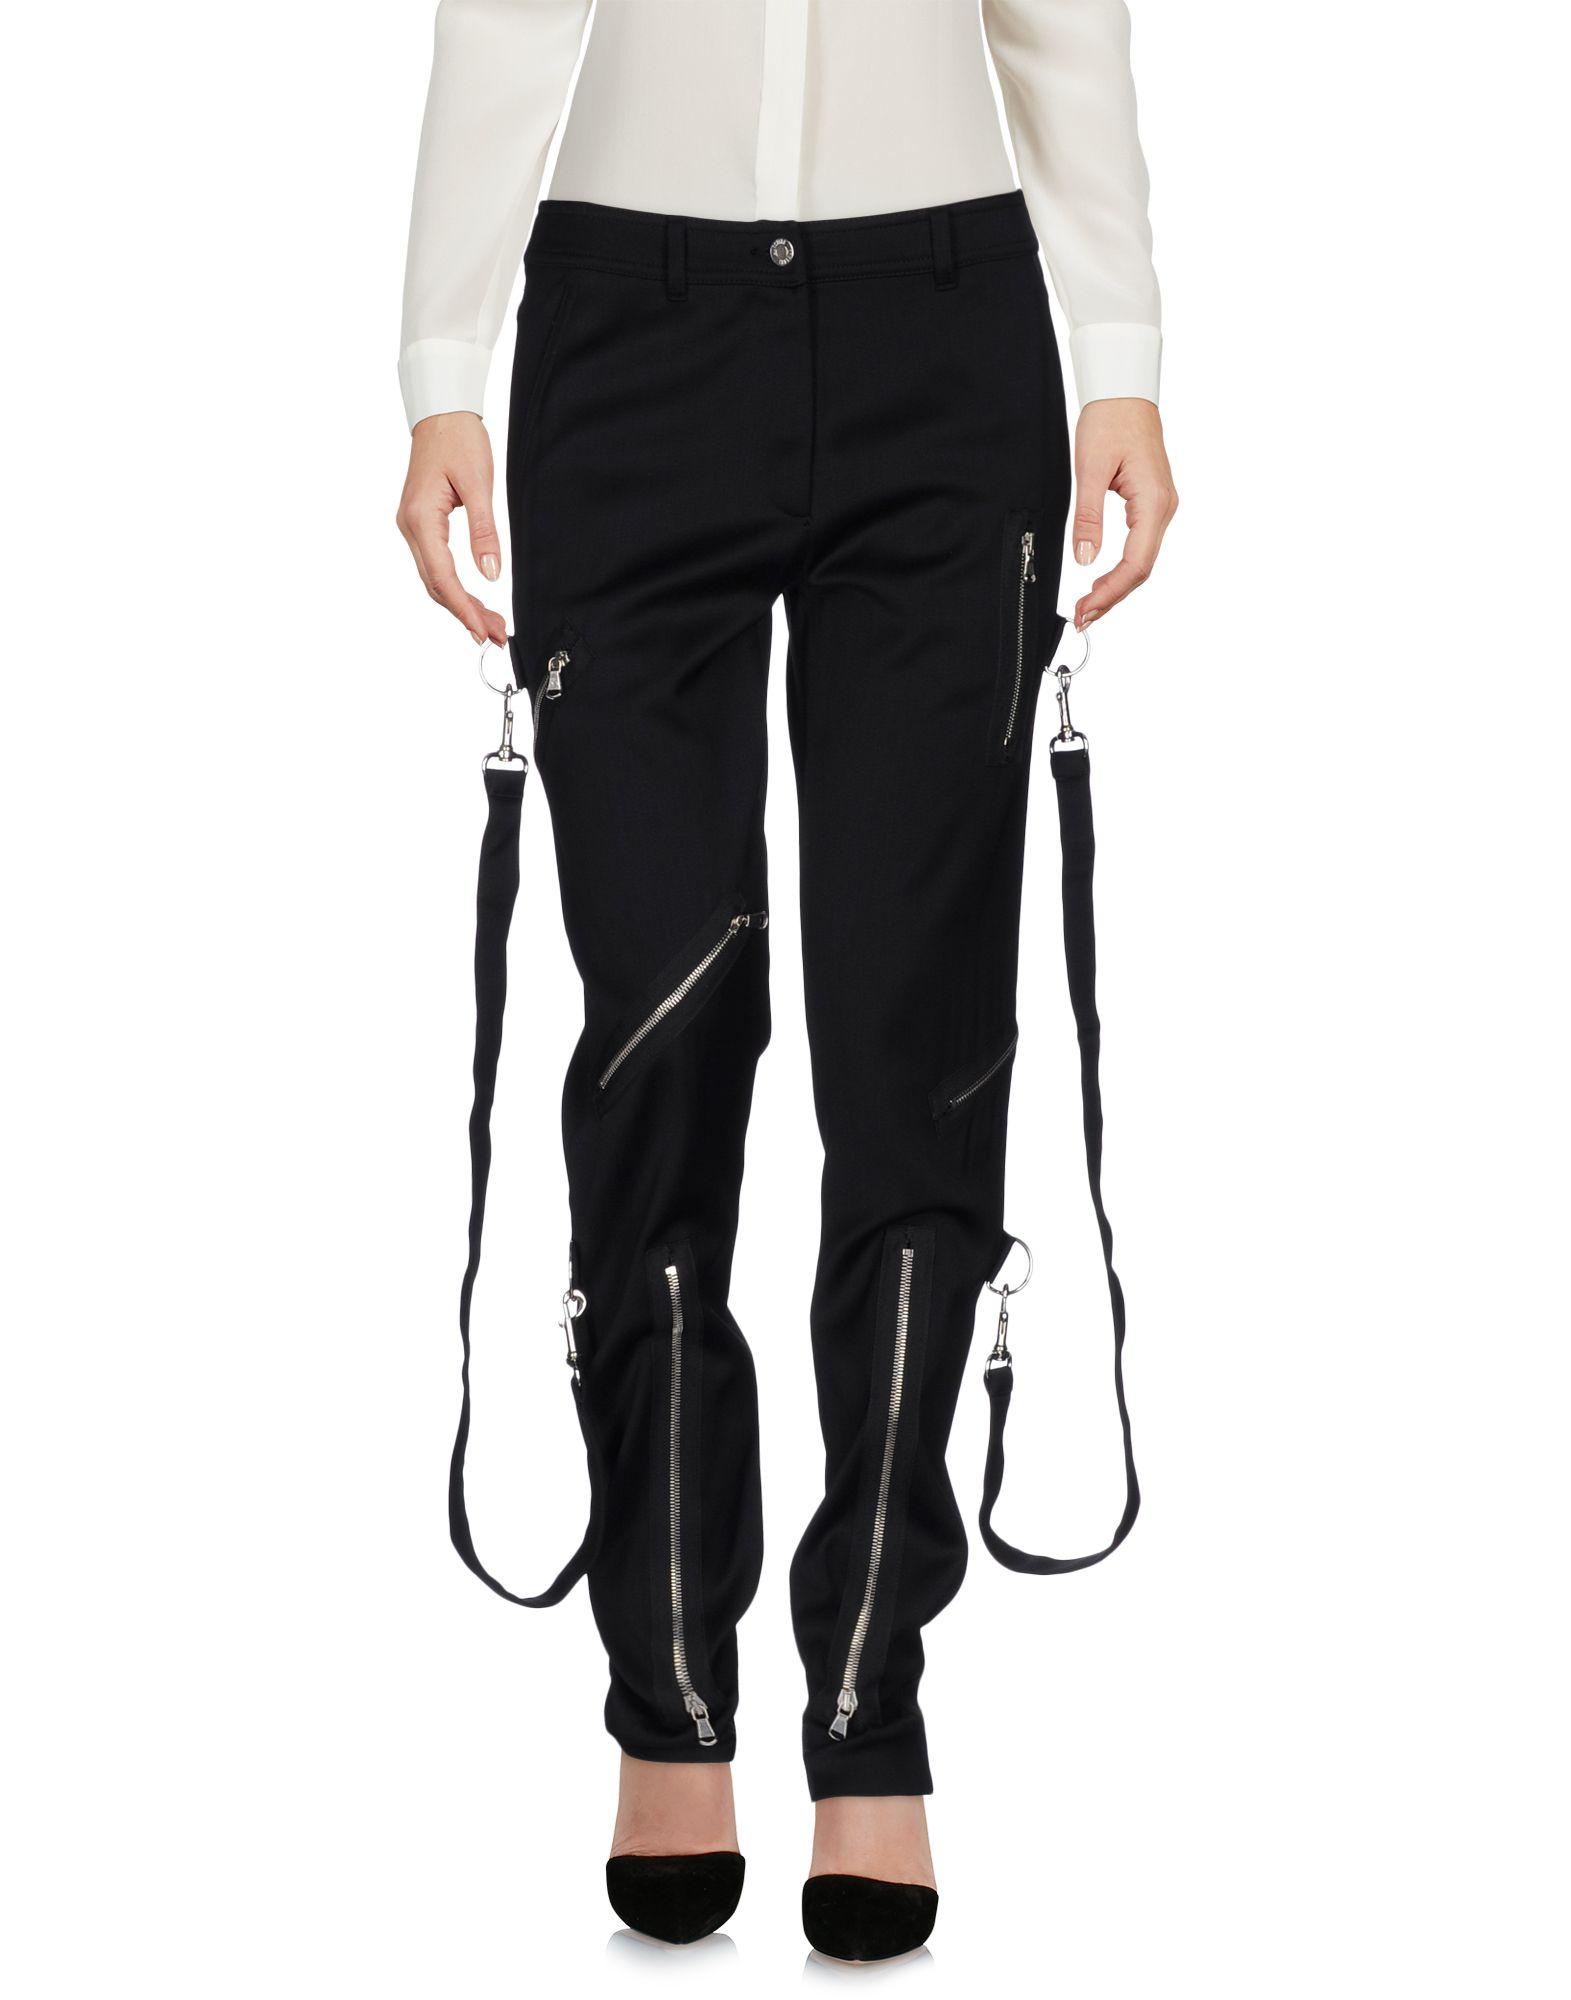 FemmesAcheter À Ligne En Pantalons Moschino cq5Aj4RL3